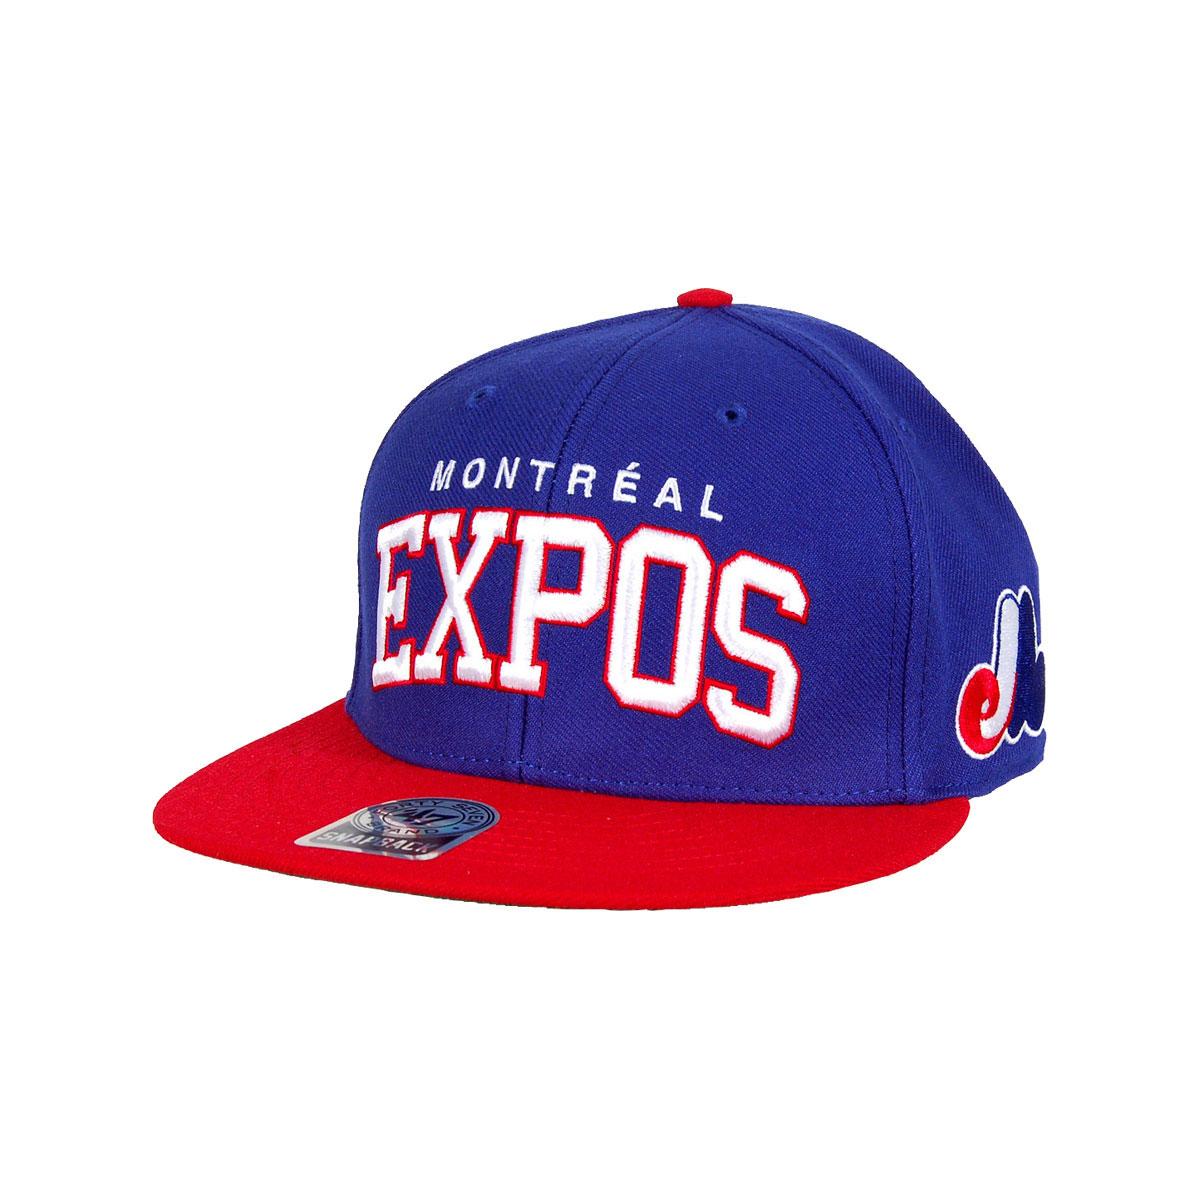 Montreal Expos Wallpaper 1200x1200